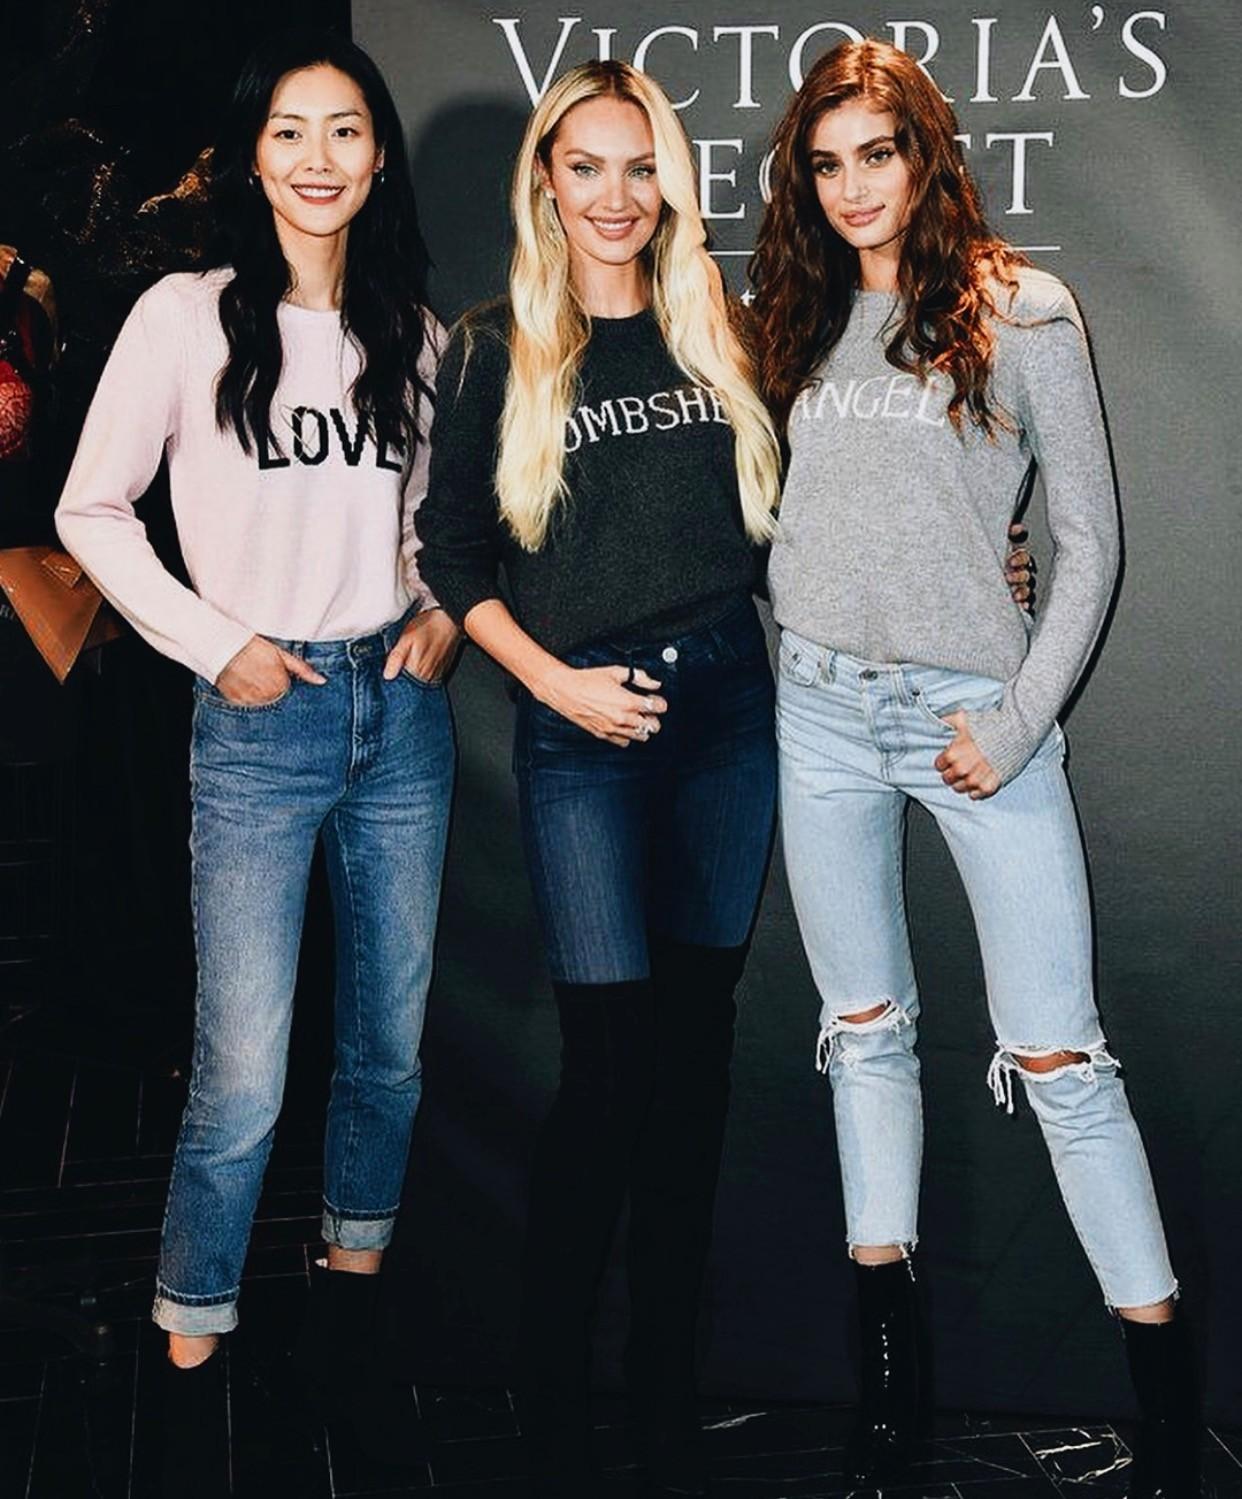 Victoria's Secret Angels in Shanghai